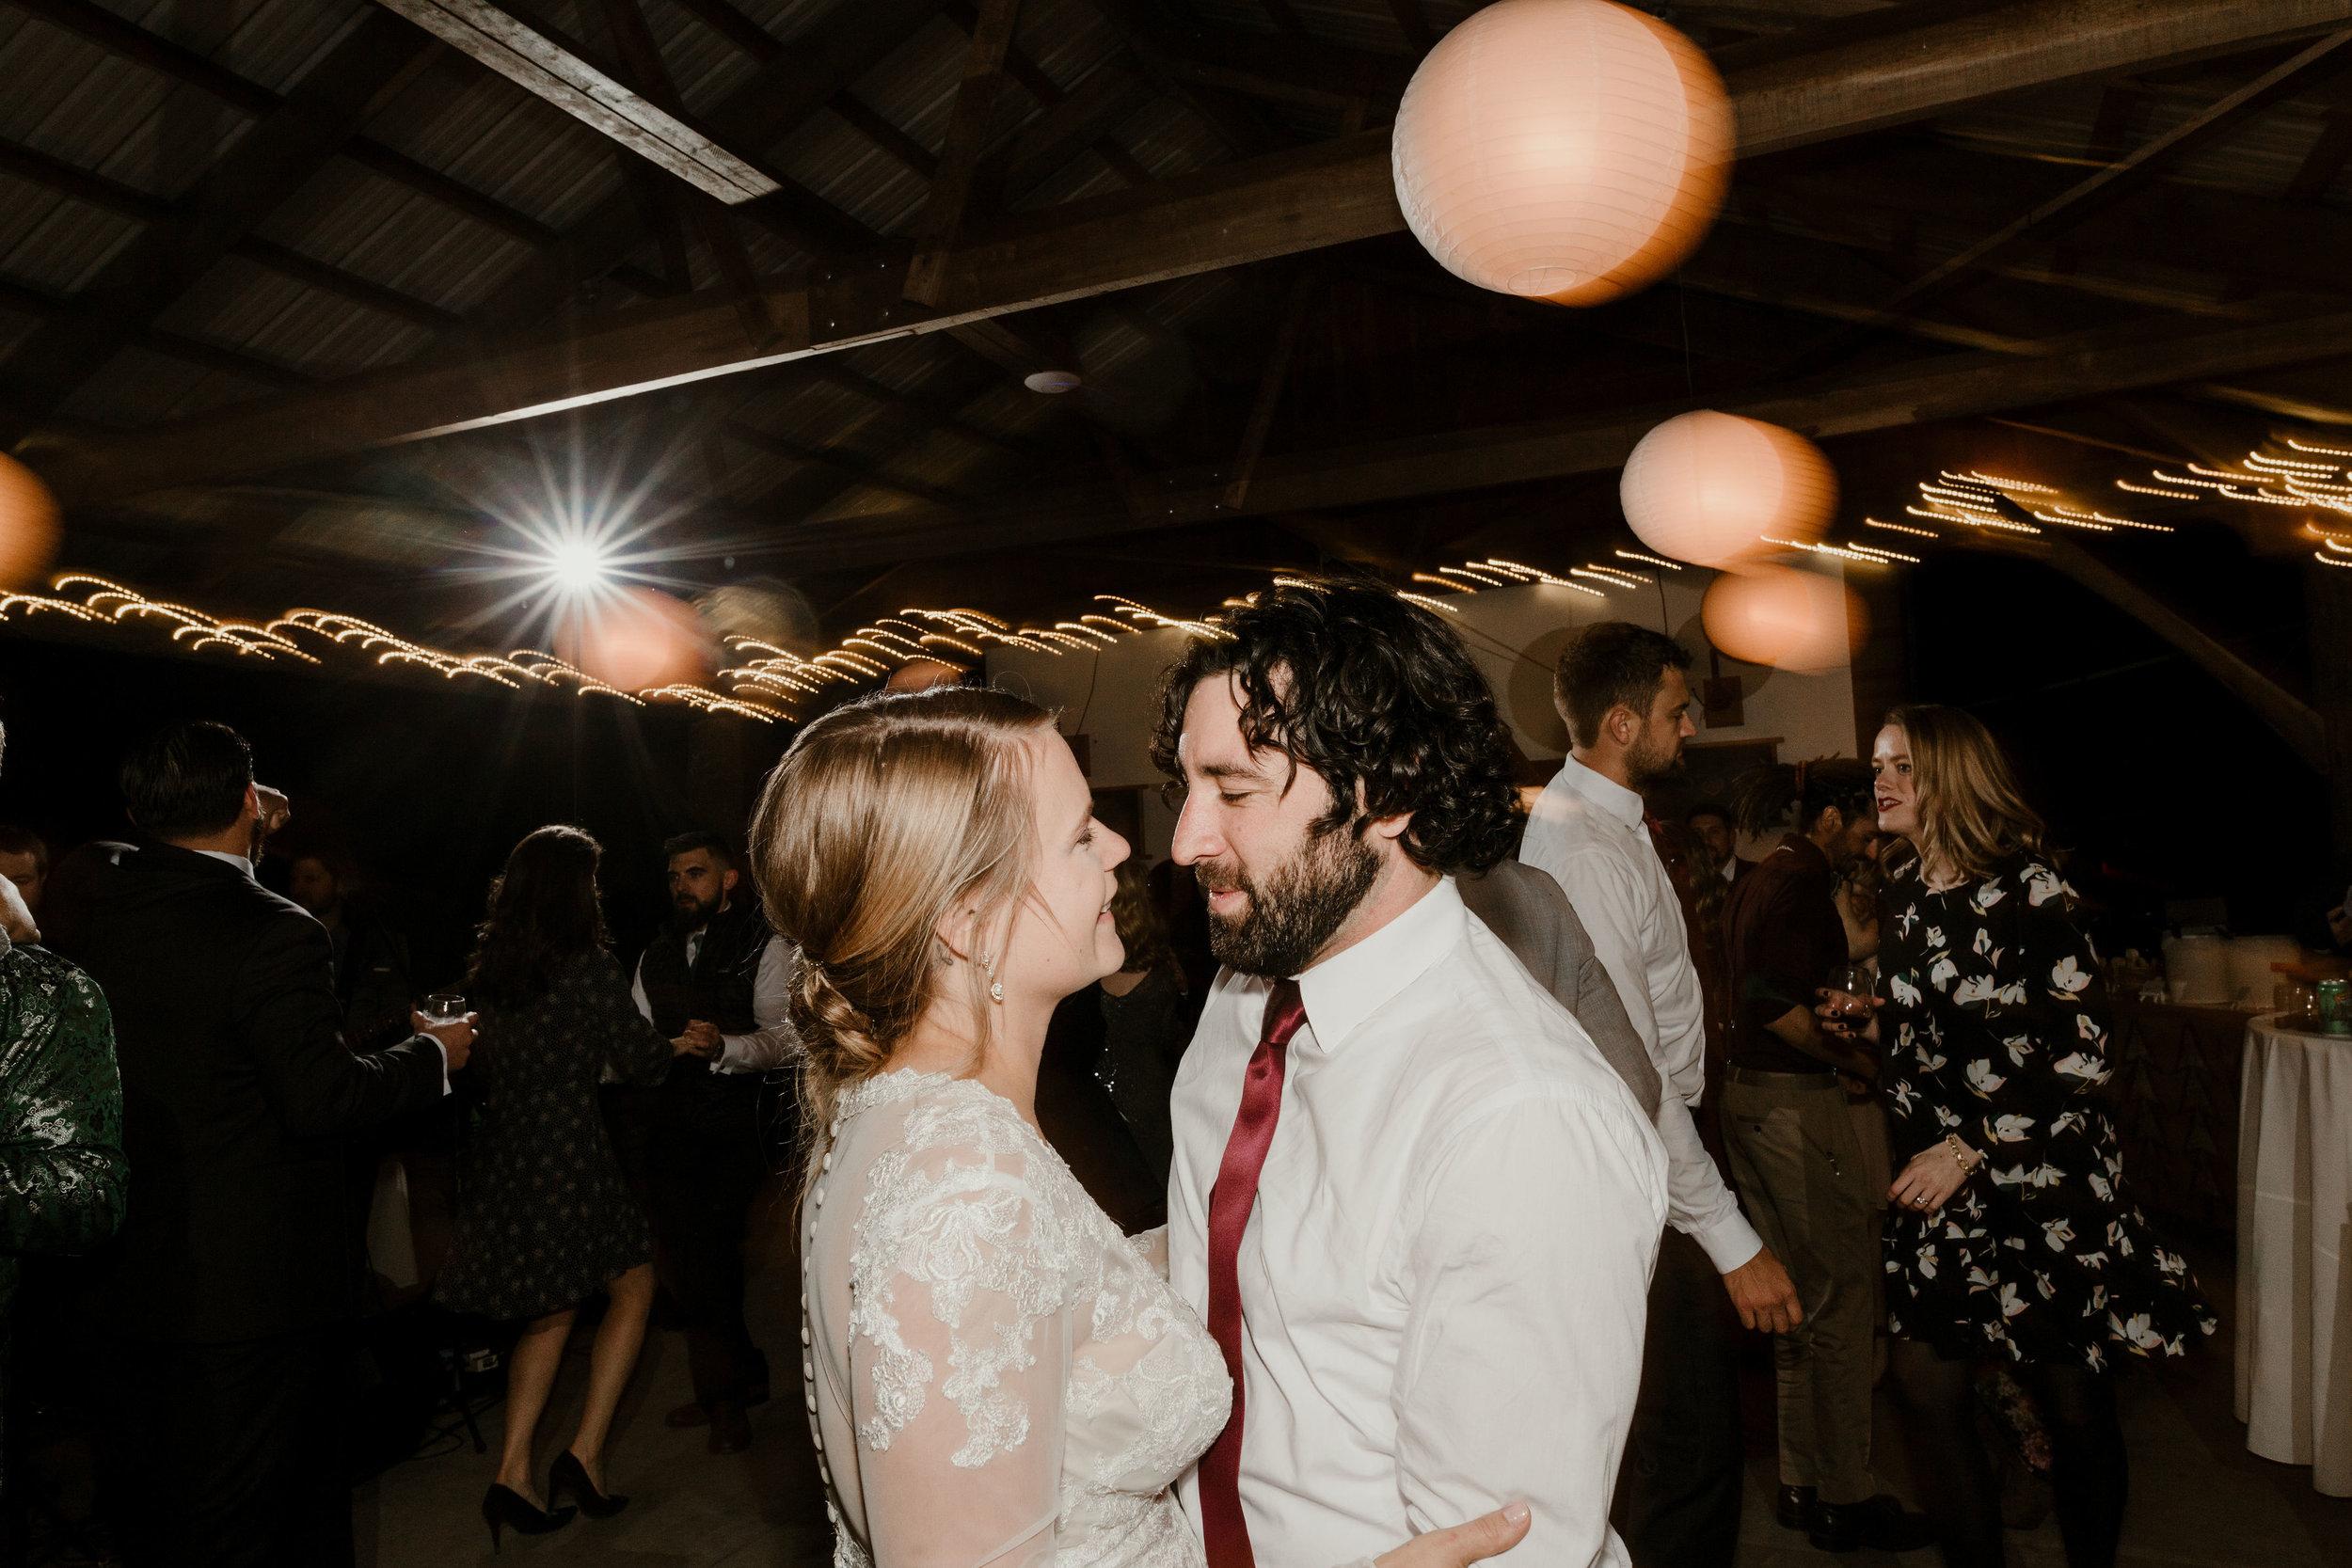 young-love-media-rustic-fall-autumn-wedding-emmerich-tree-farm-hudson-valley-warwick-new-york-reception-390.jpg